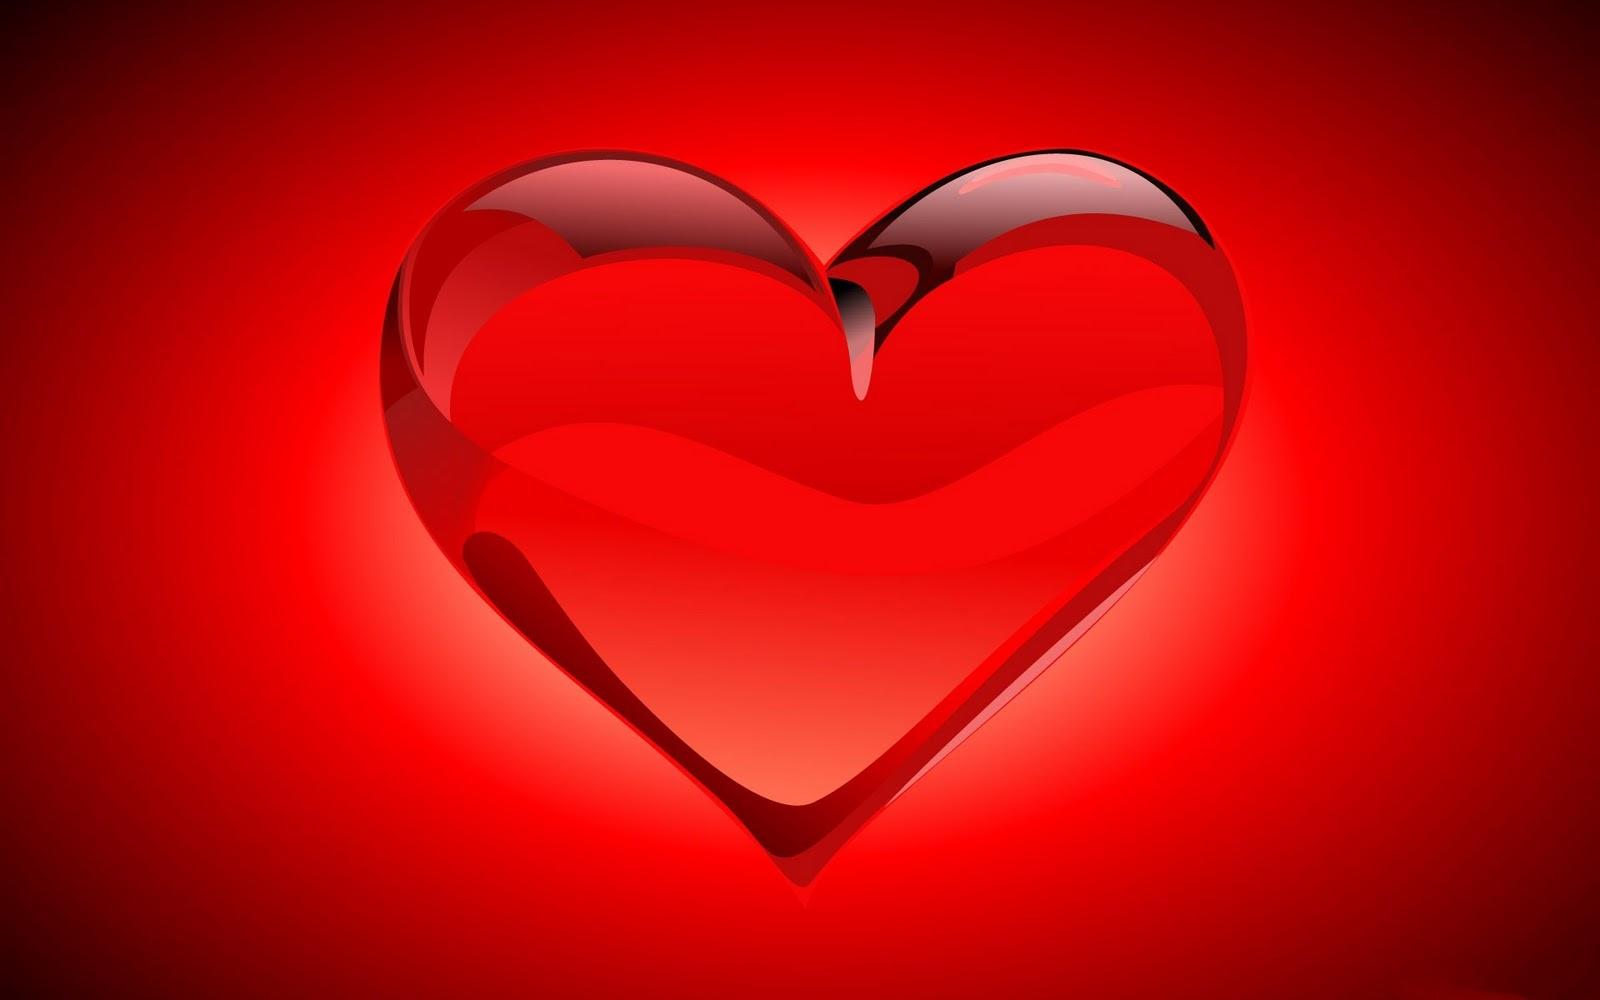 Desktop Backgrounds 4U: Valentine